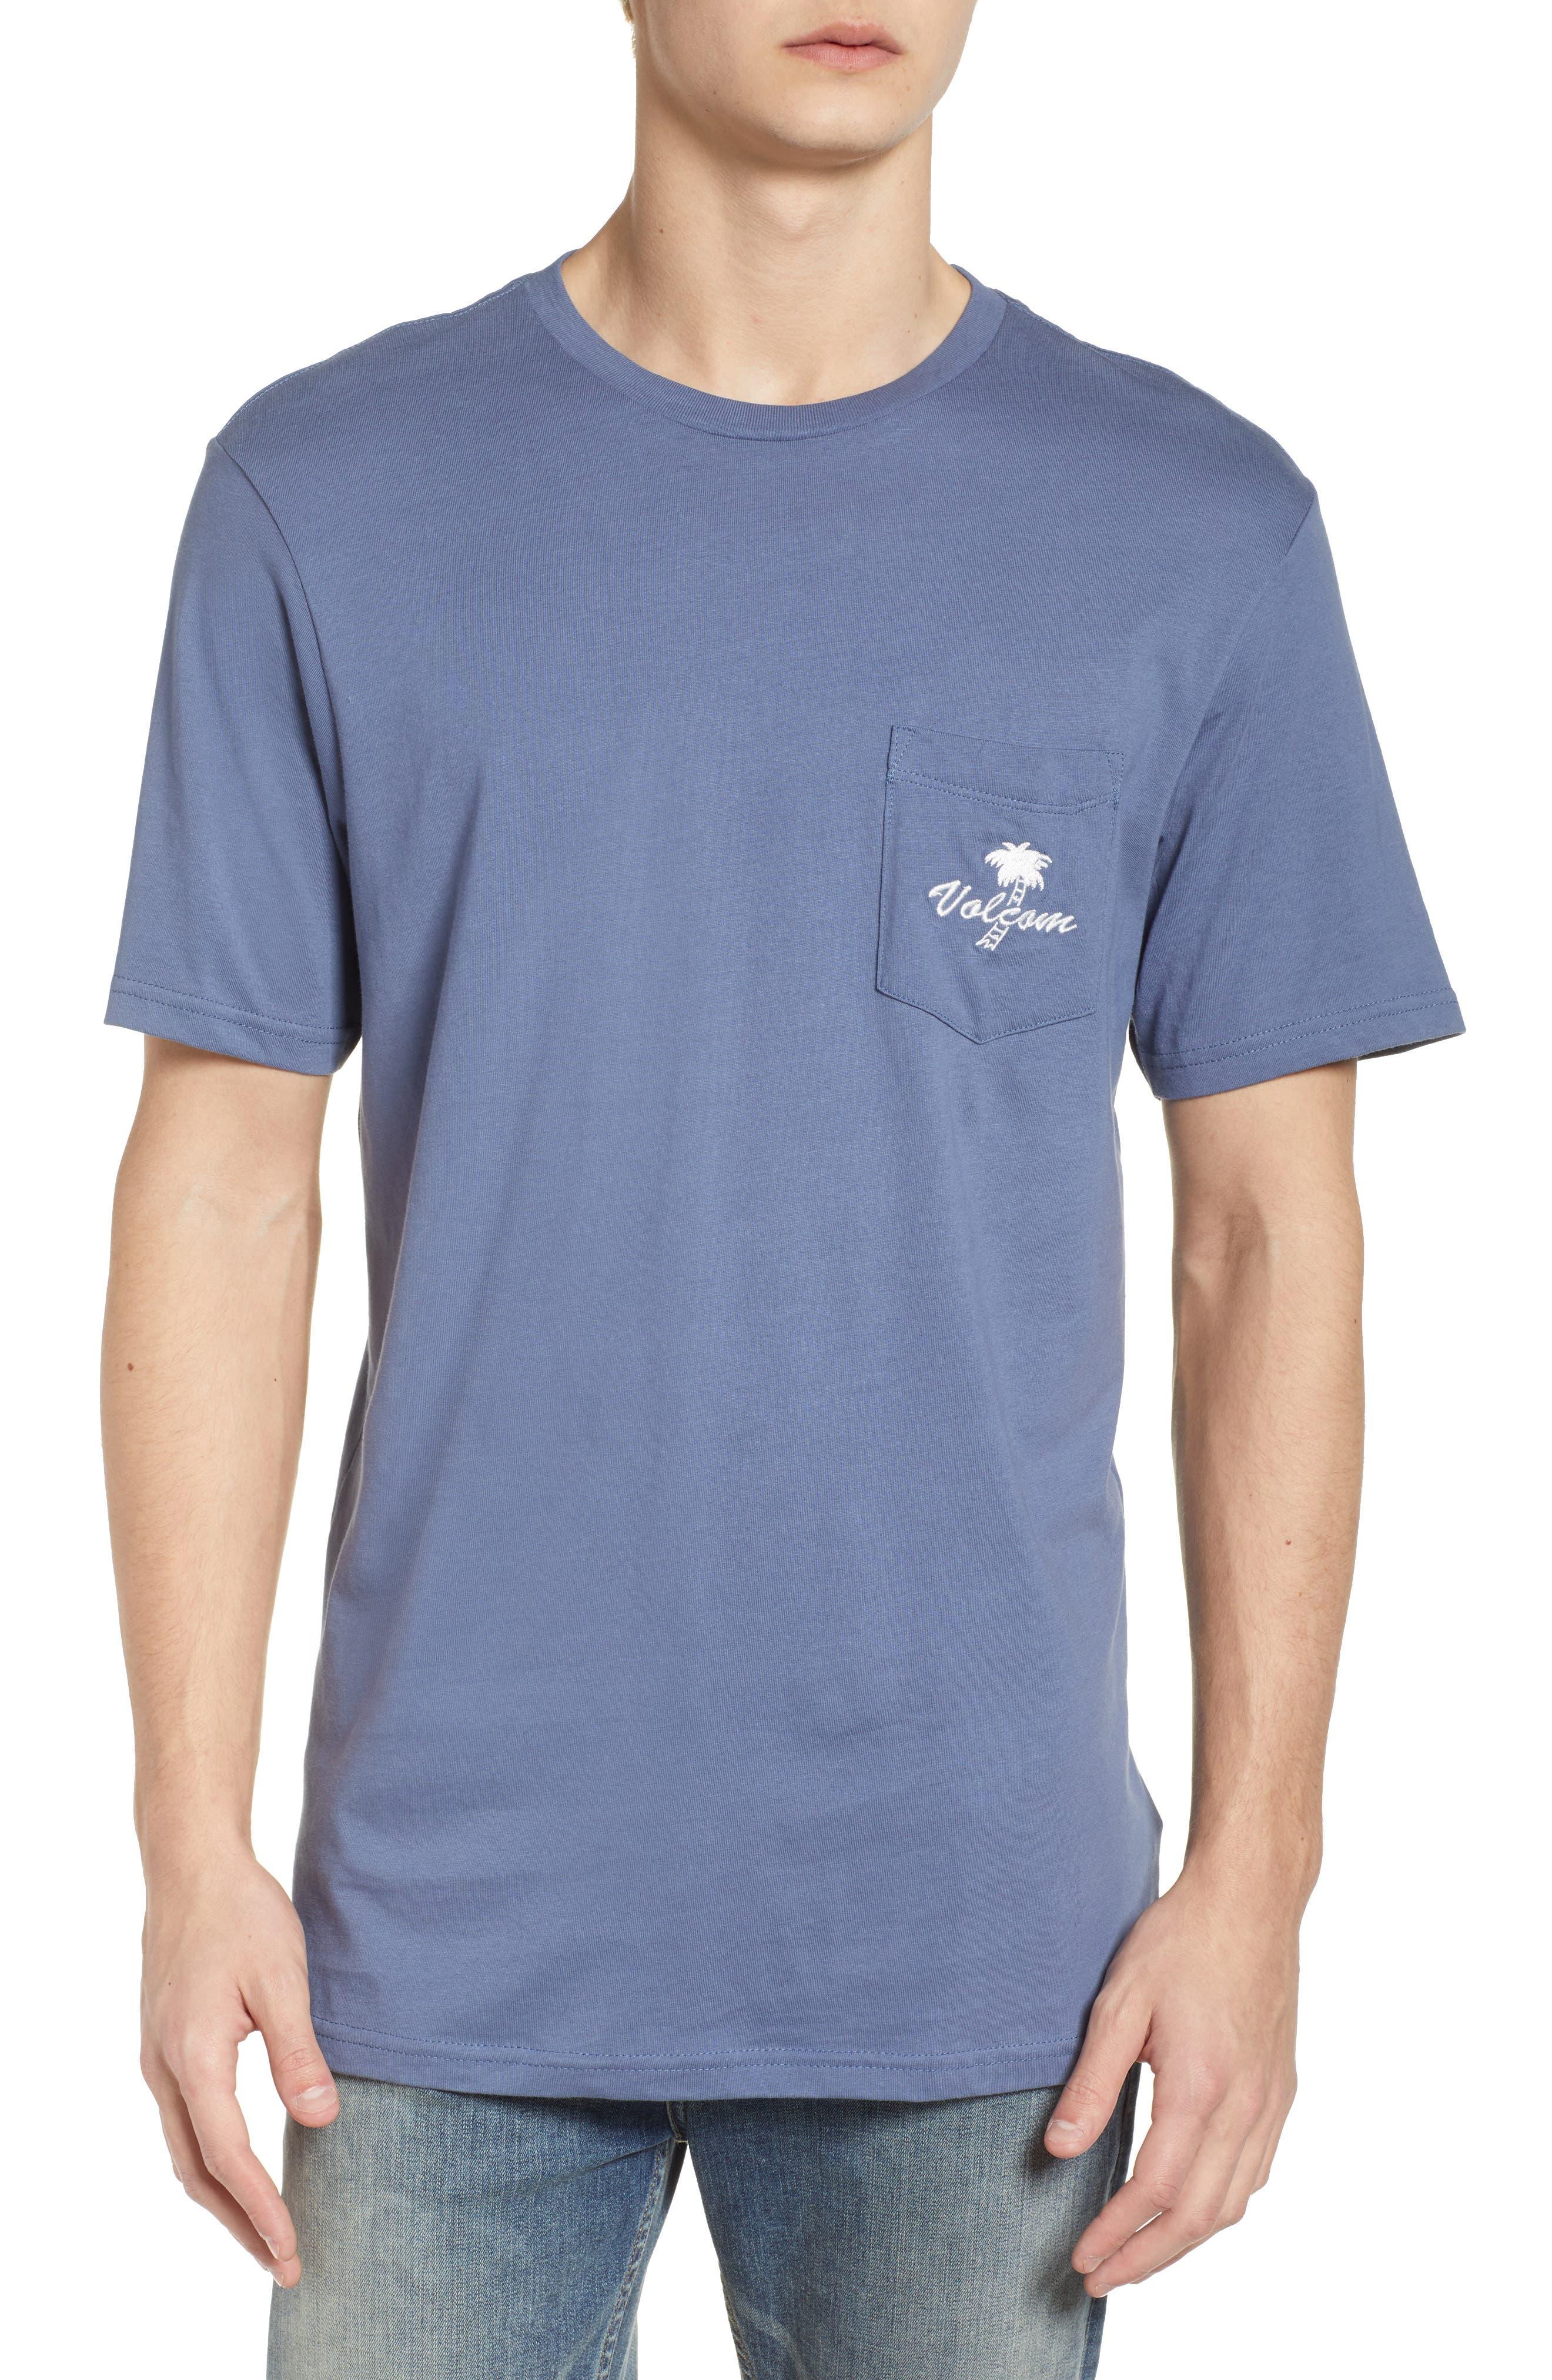 Last Resort Pocket T-Shirt,                             Main thumbnail 1, color,                             463